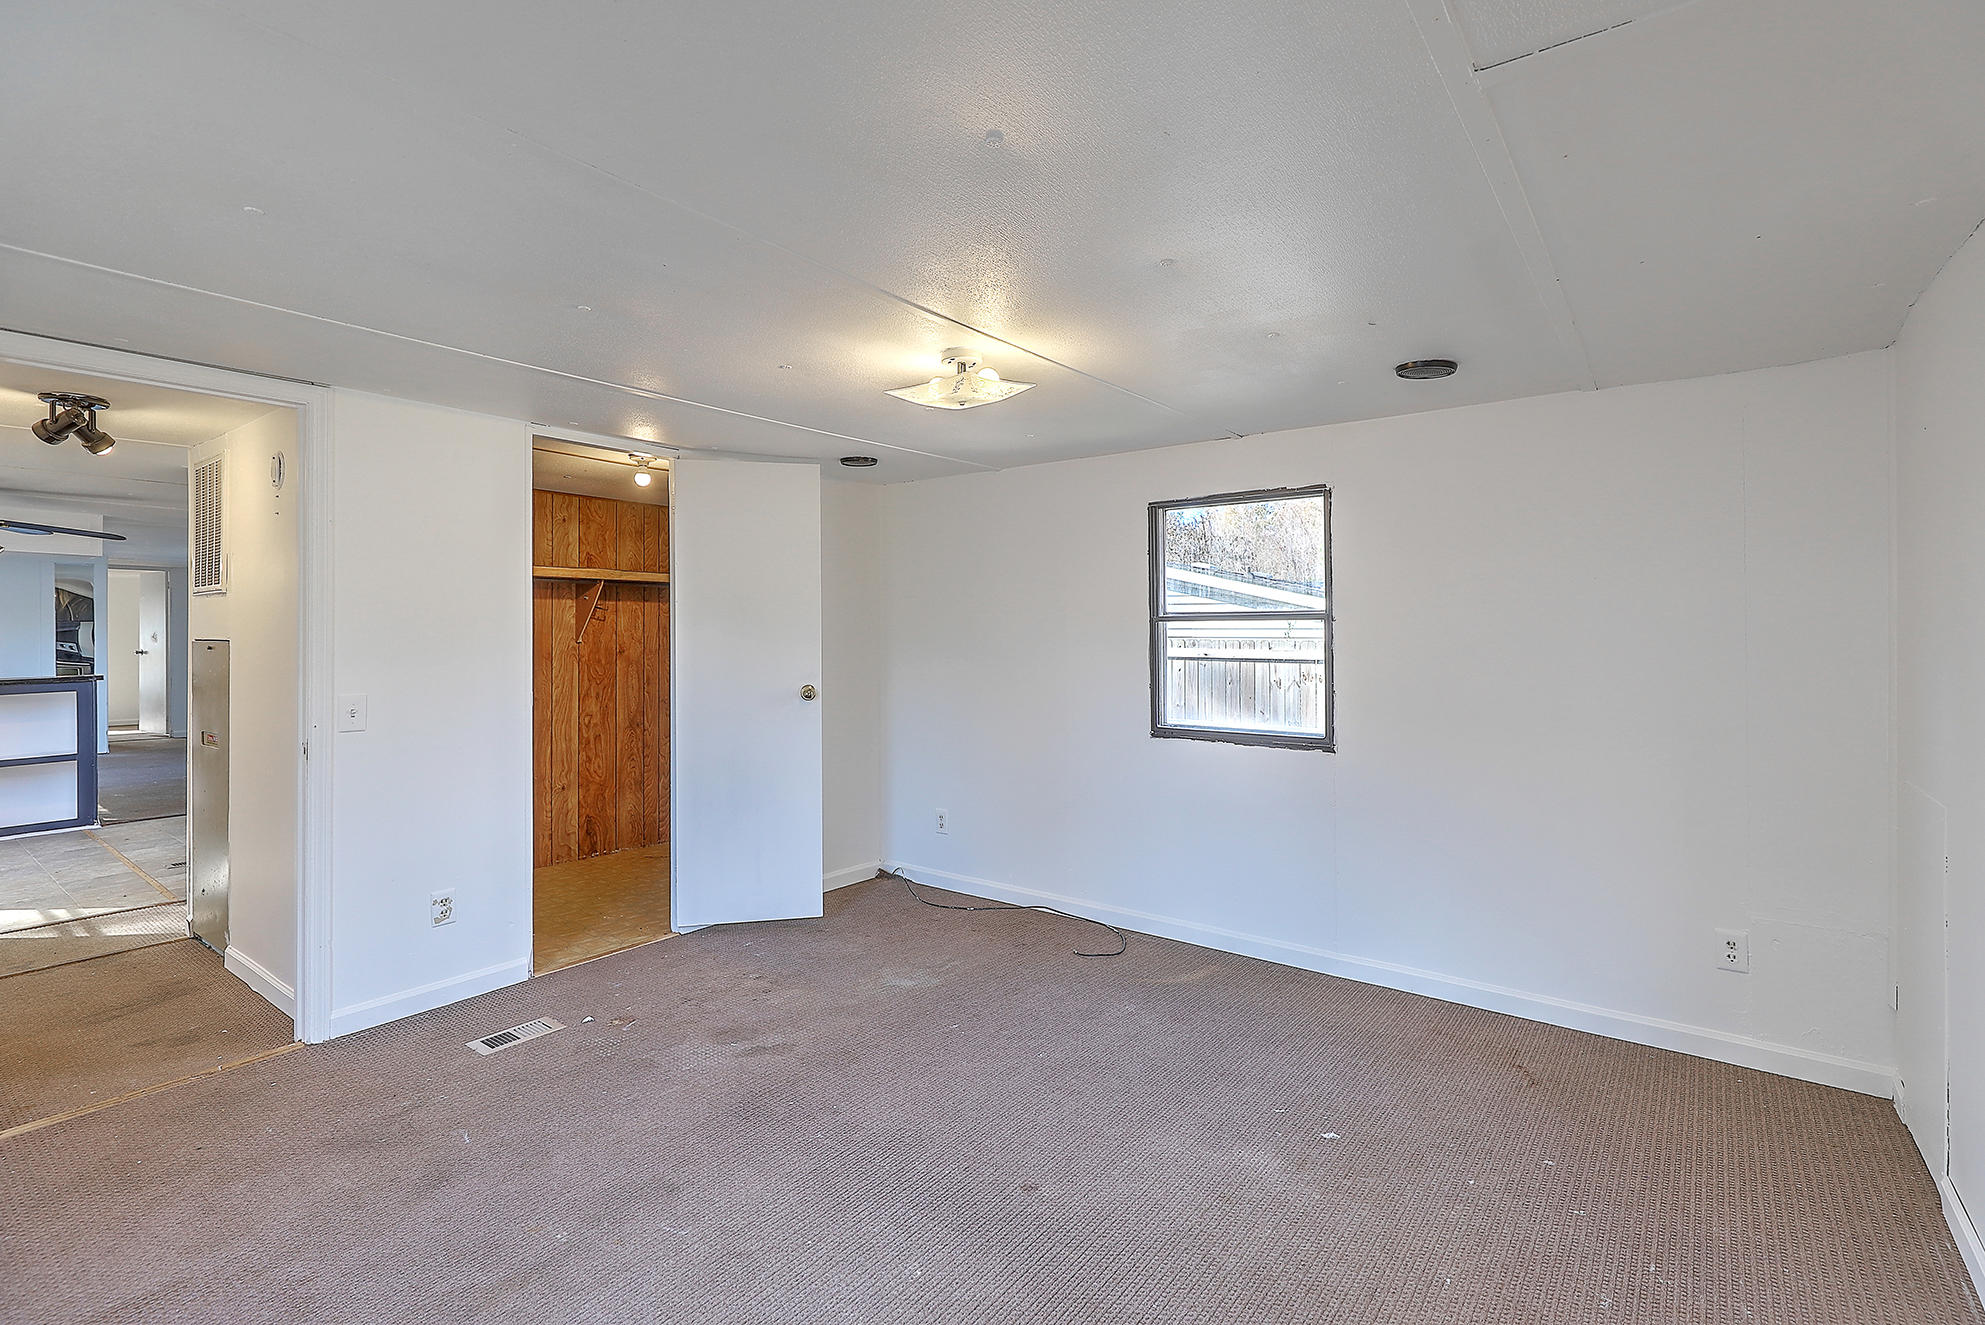 Caromi Village Homes For Sale - 323 Raymond, Ladson, SC - 16